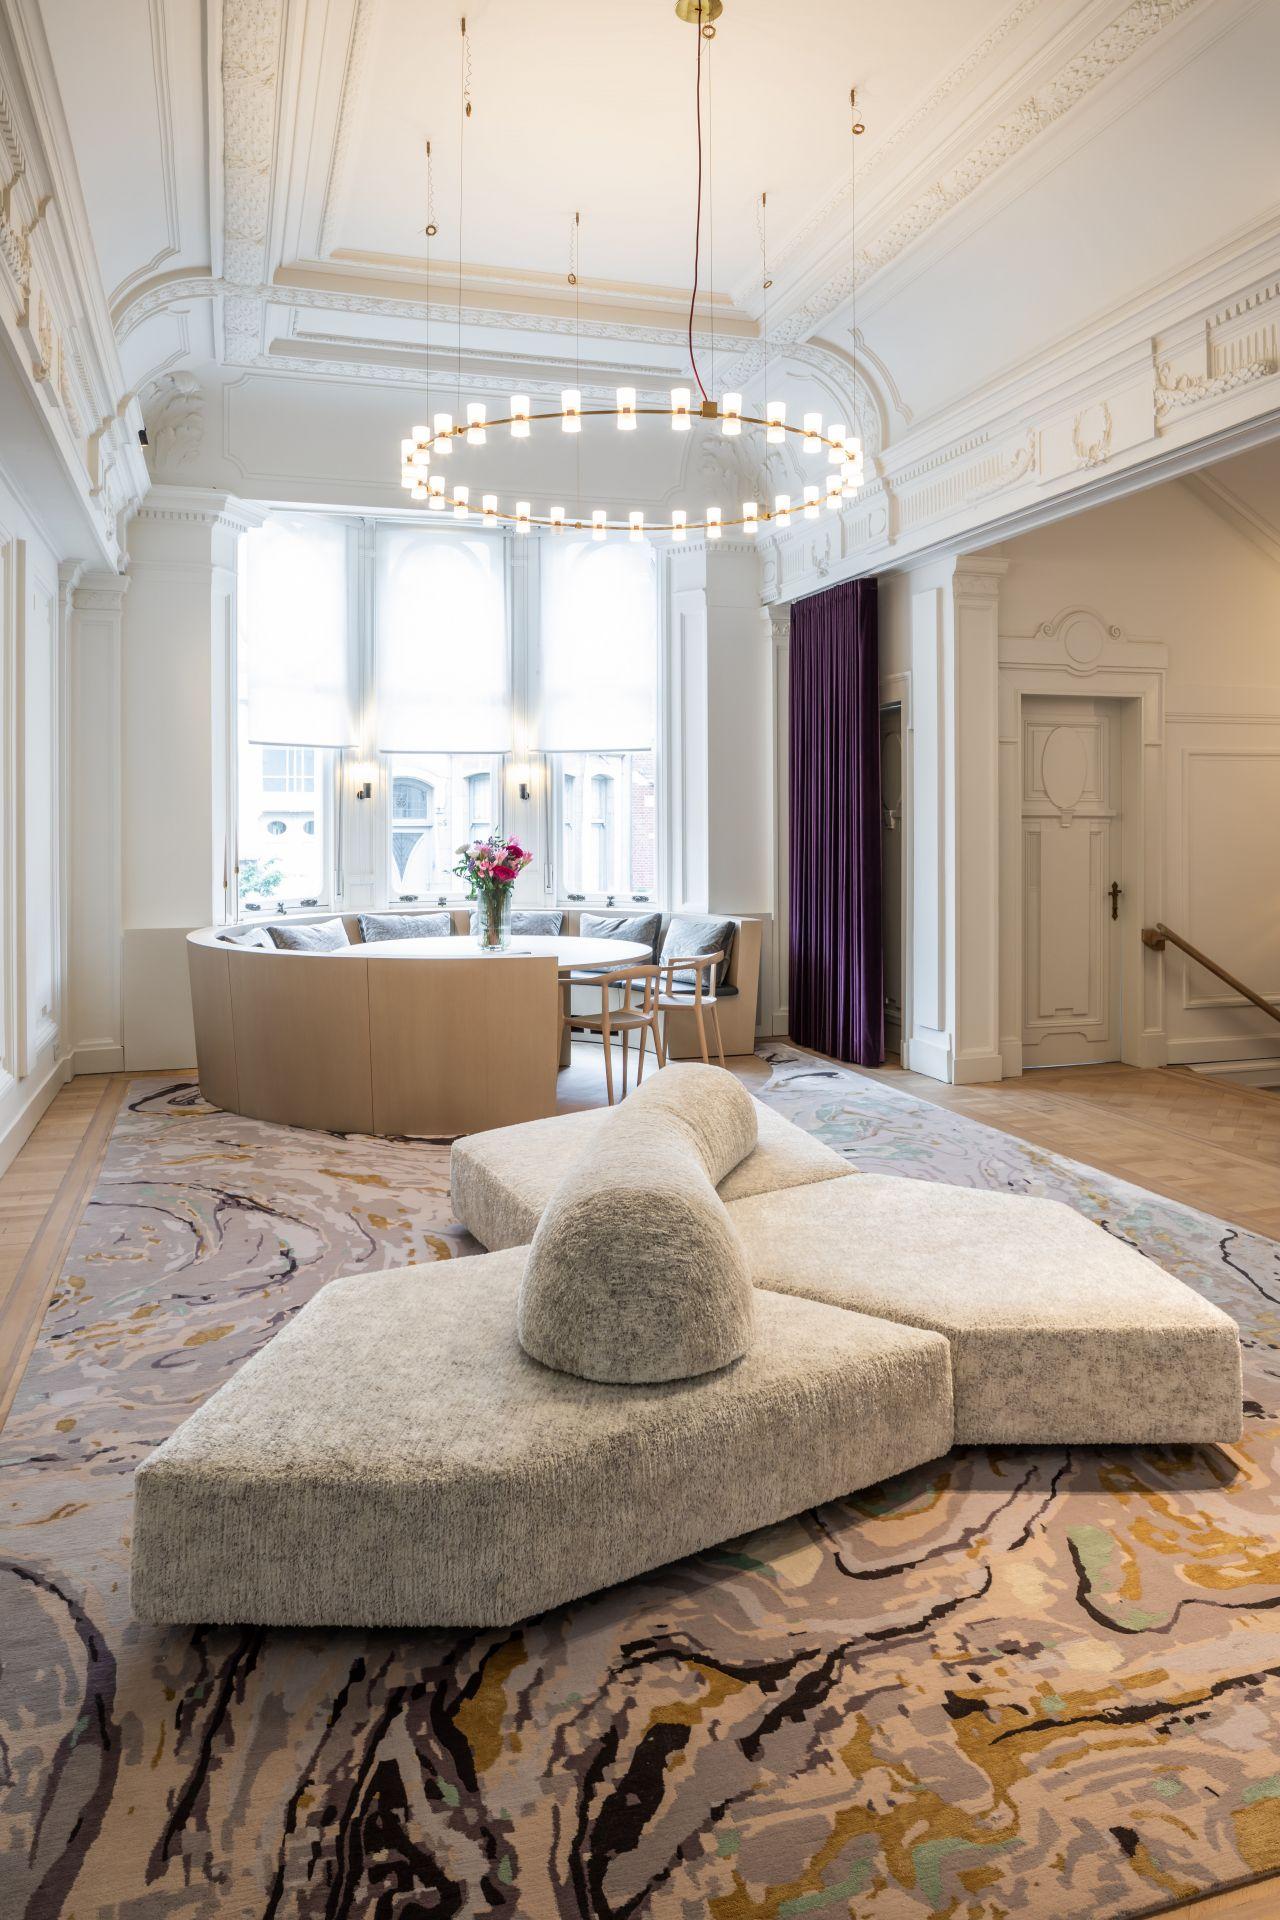 Appartamento ad Anversa - image 7